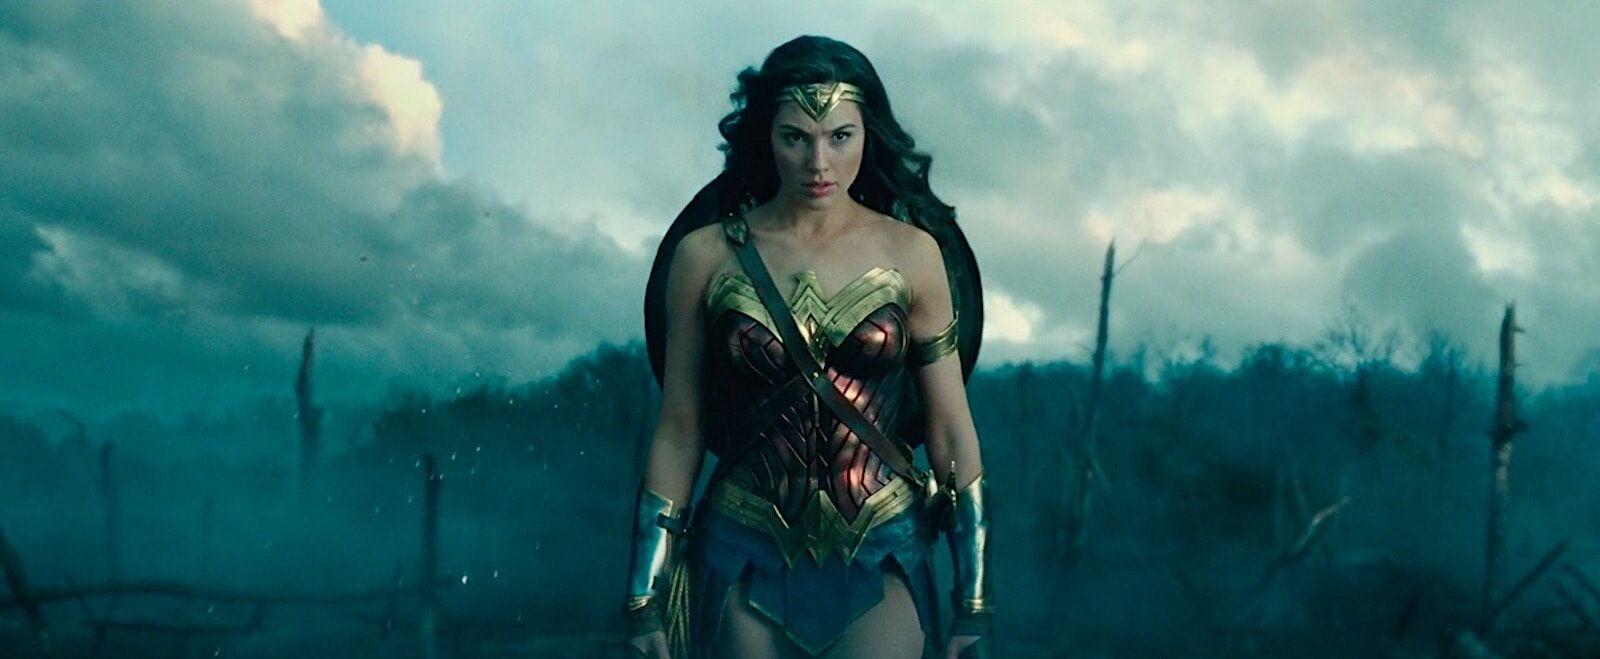 shoulder-level--Cowboy-Shot-Wonderwoman